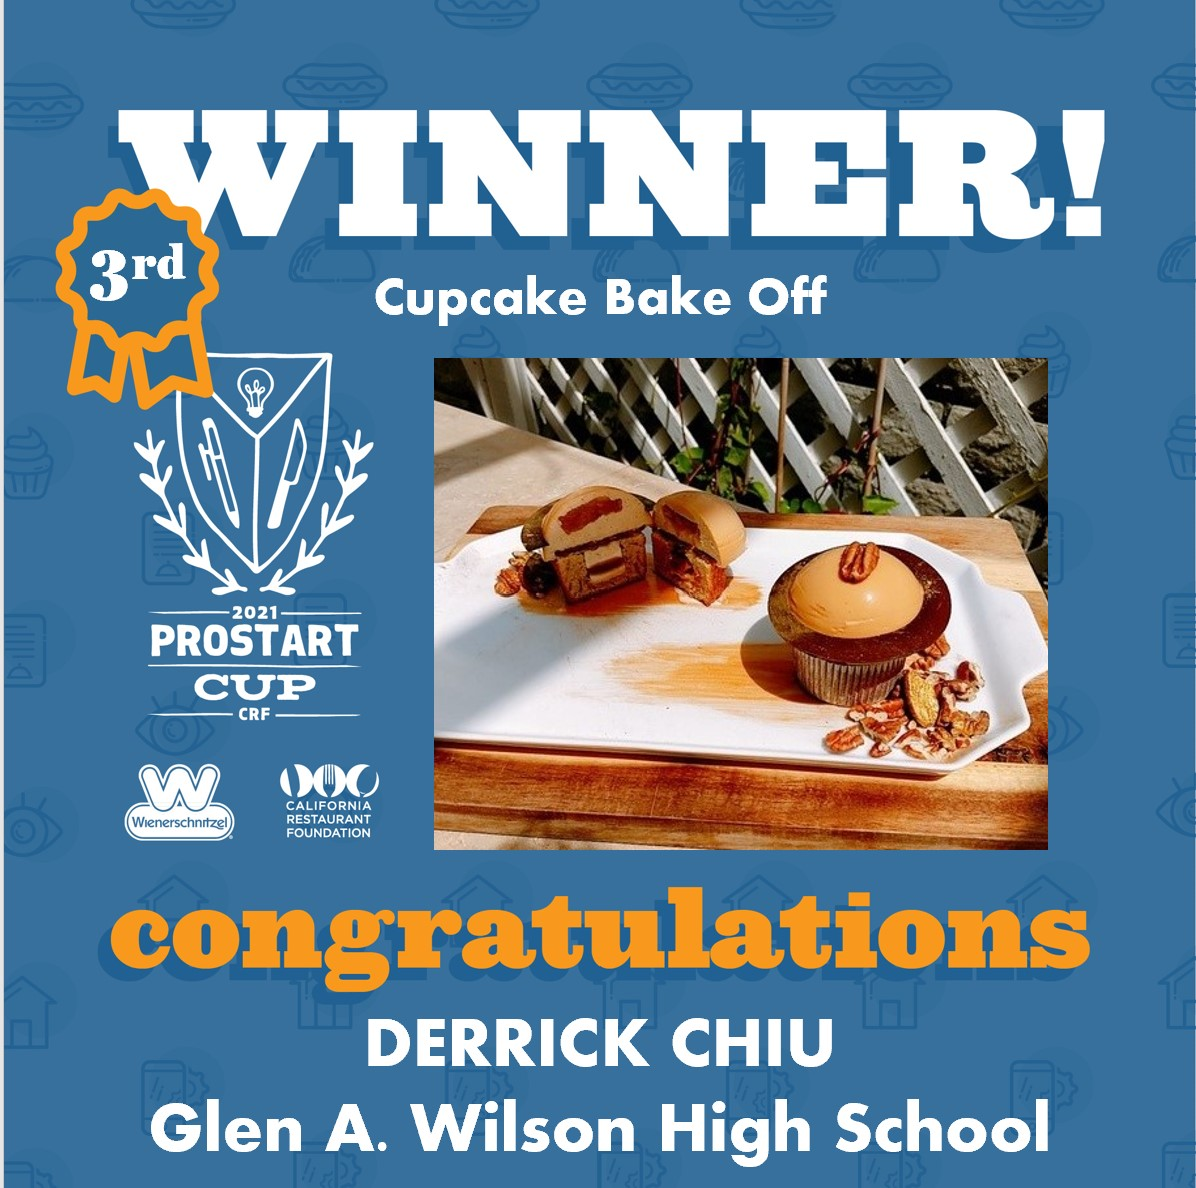 2021 ProStart Winner - Cupcake Back Off - 3rd Place